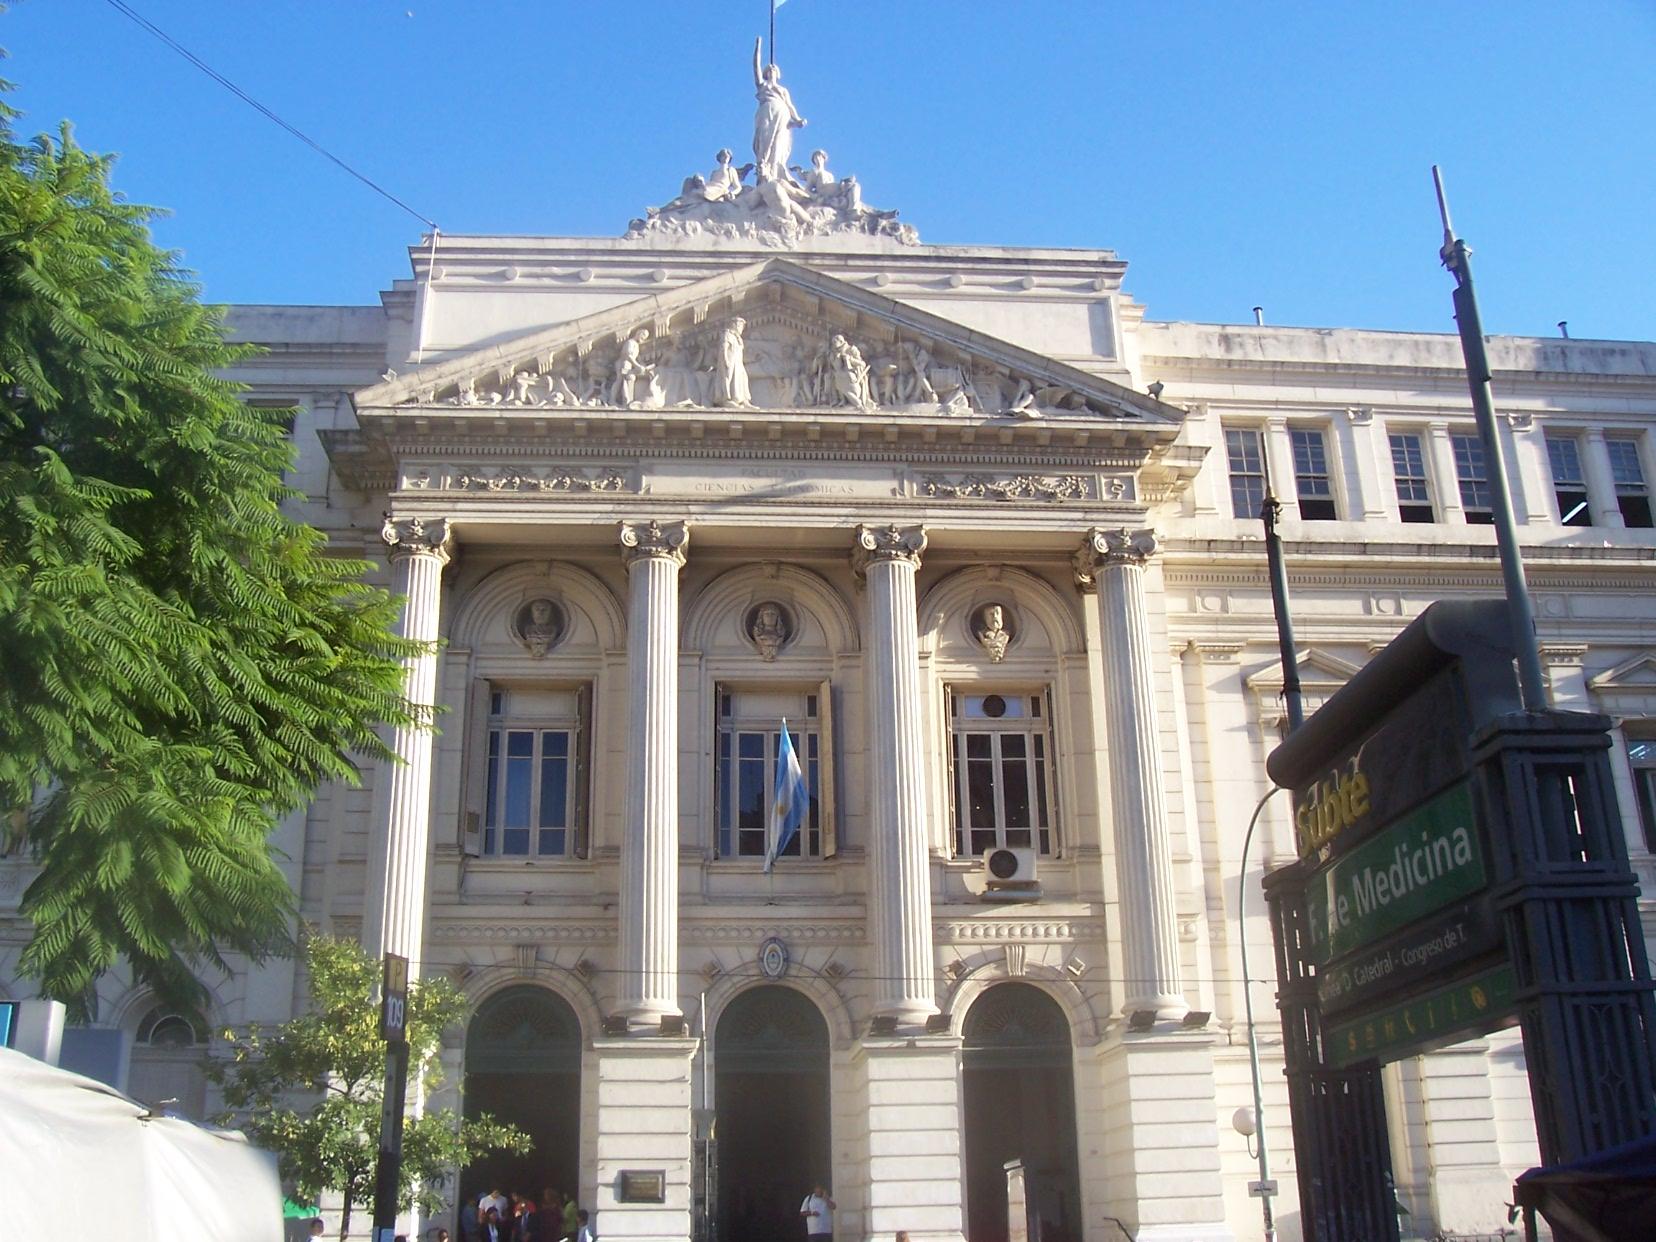 Facultad De Medicina  UBA Image: File:UBA-economicas.JPG